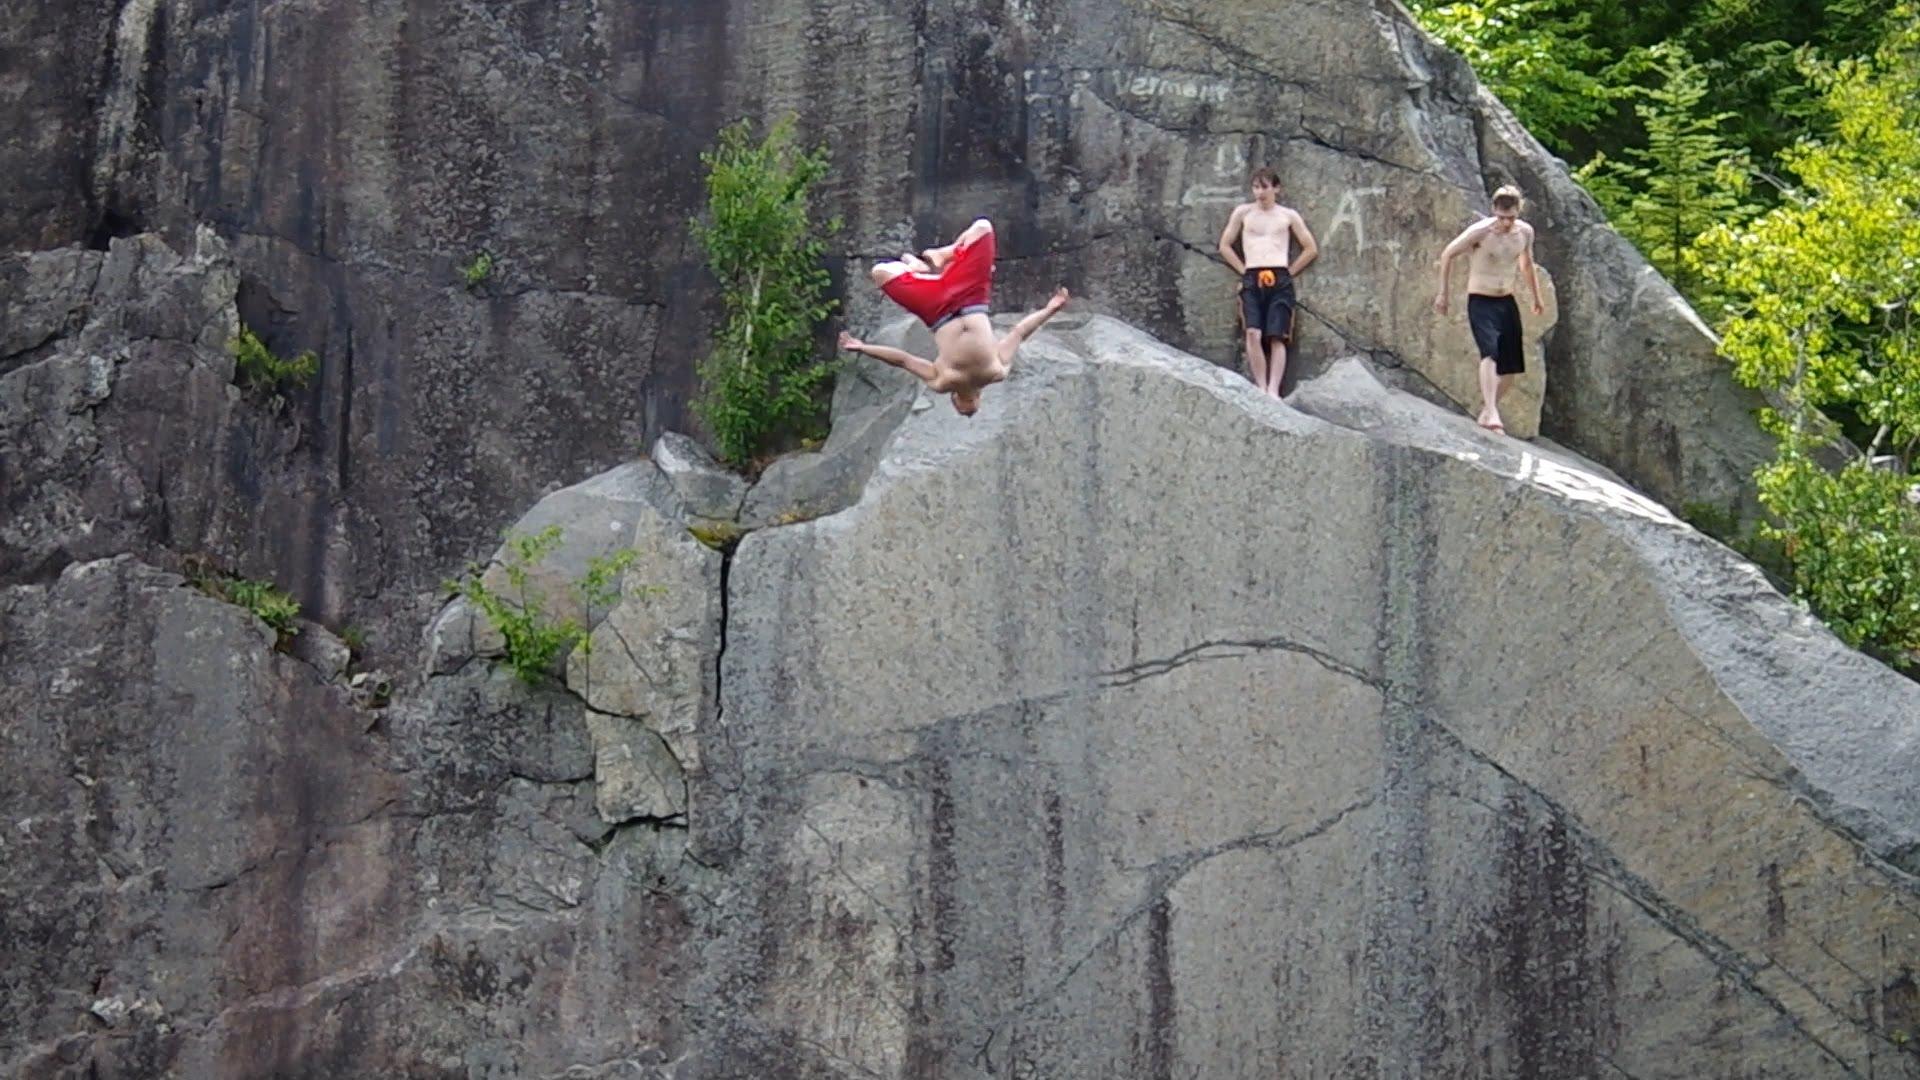 Vermont Cliff jumping Granite Quarry - YouTube